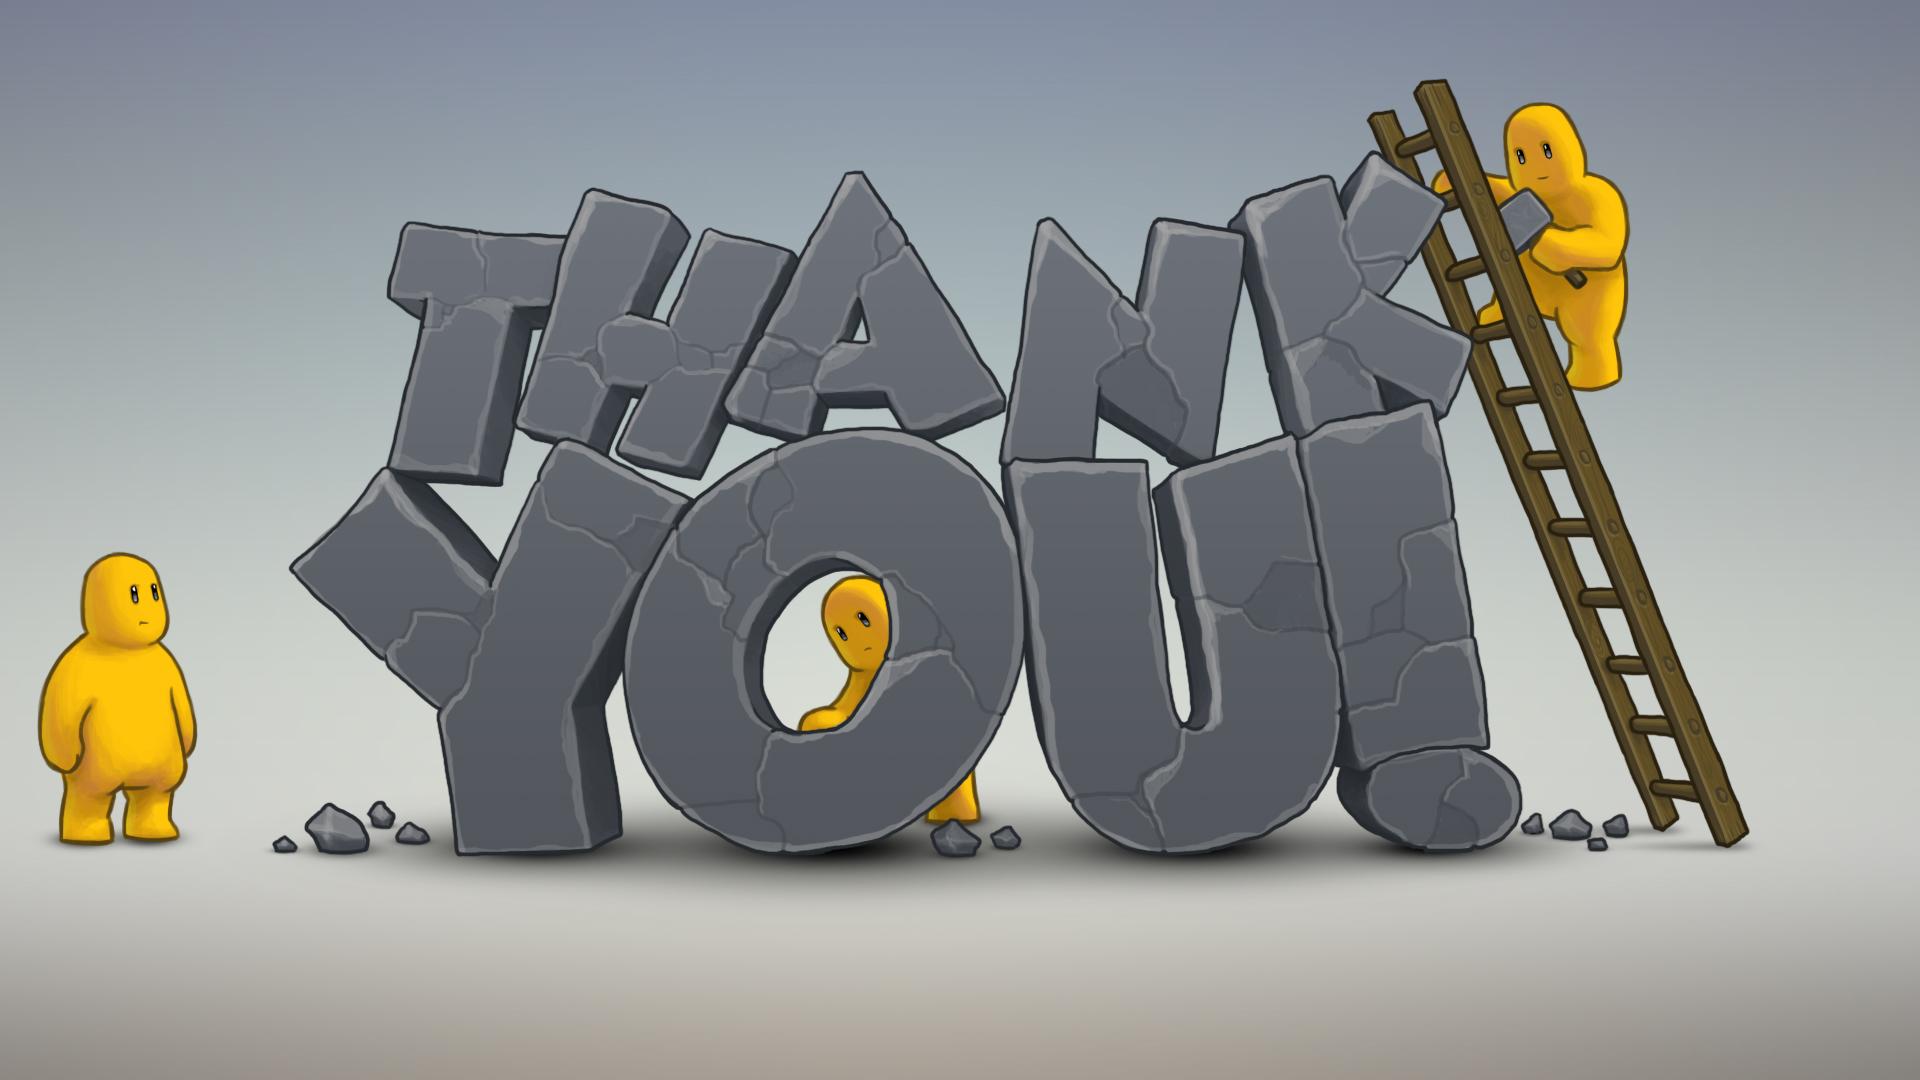 Thank You Wallpapers Top Beautiful Pics 4k Ultra Jpg Thank You Wallpaper Hd 1920x1080 Wallpaper Teahub Io